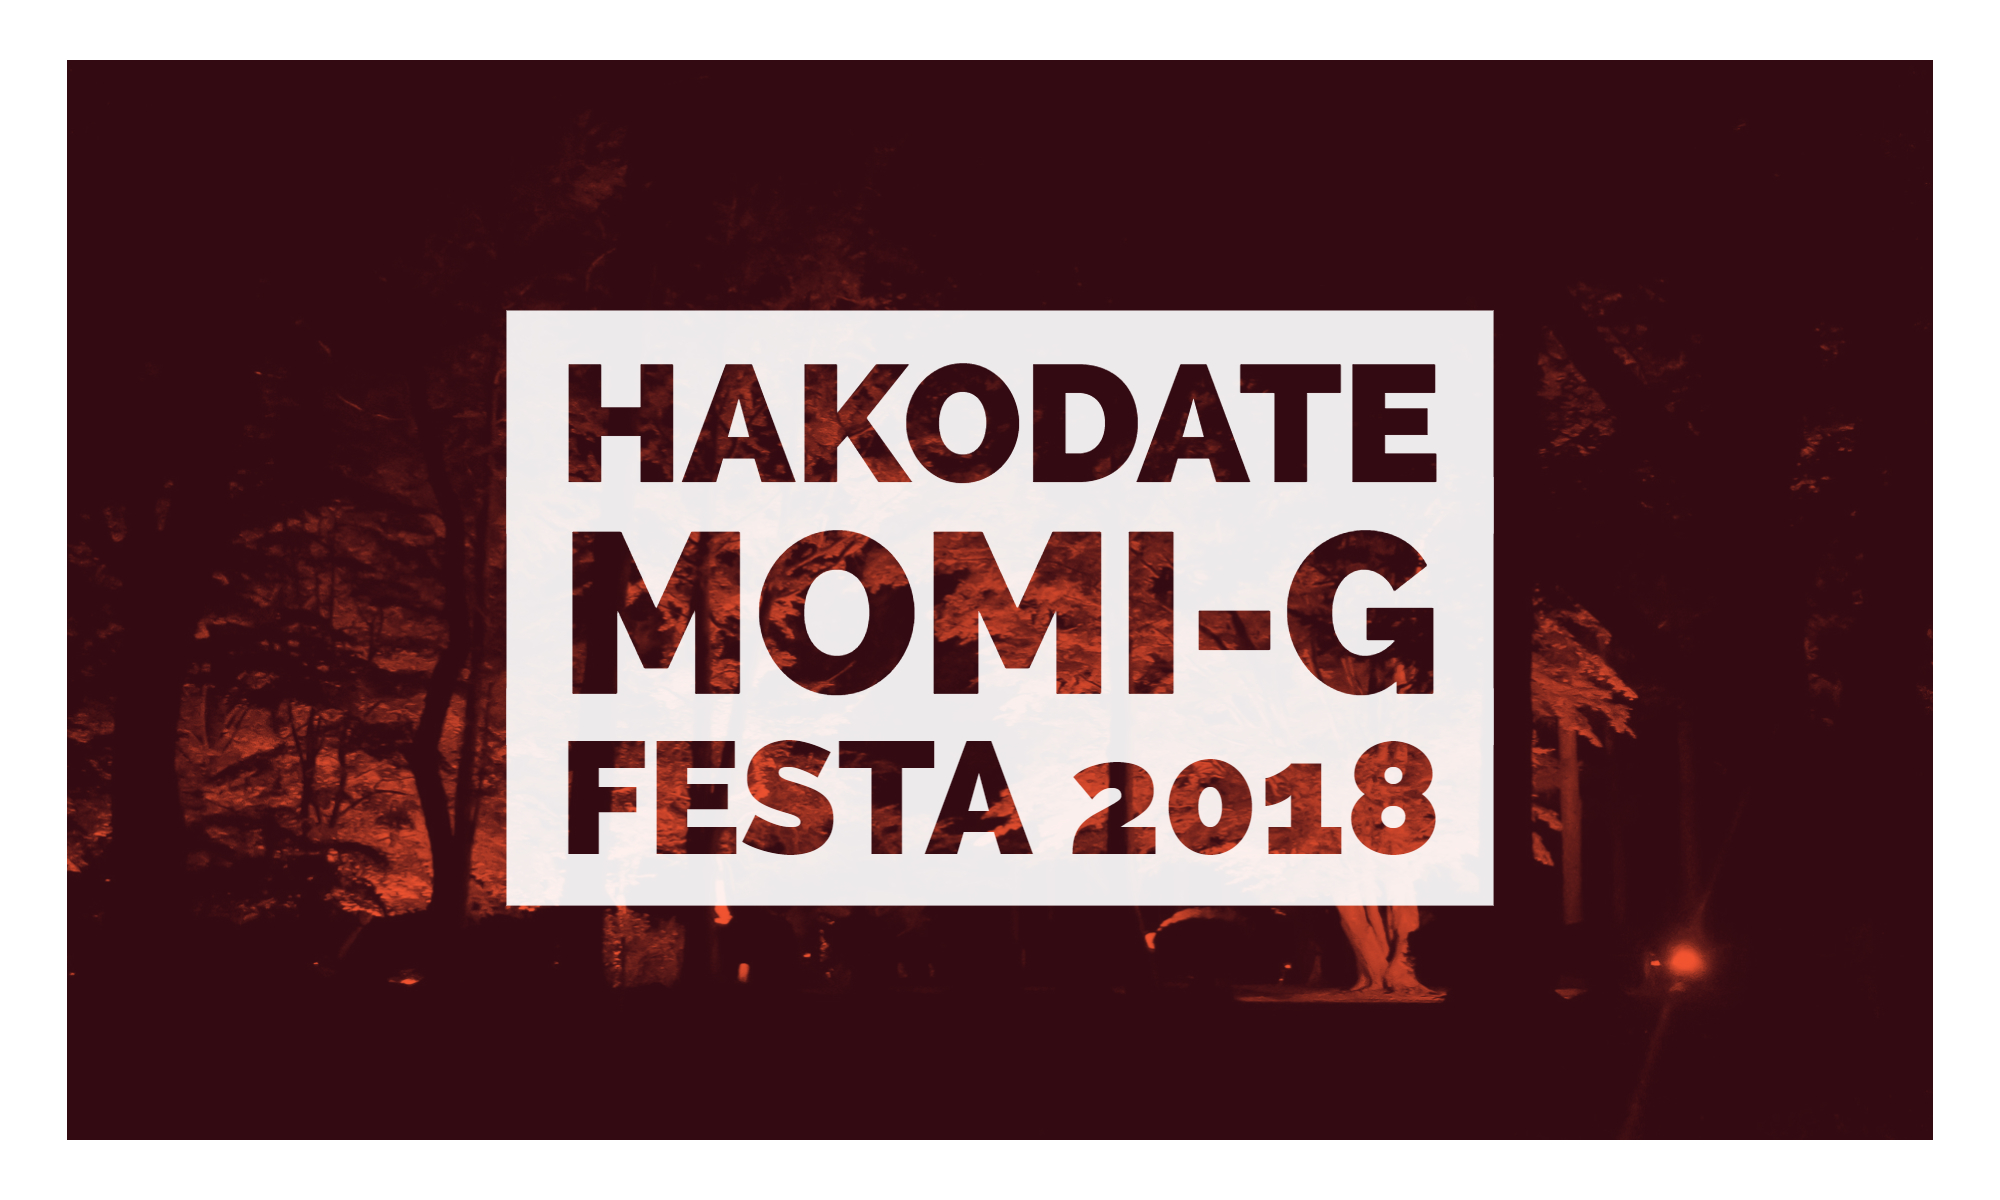 HAKODATE MOMI-G FESTA 2018_blog image